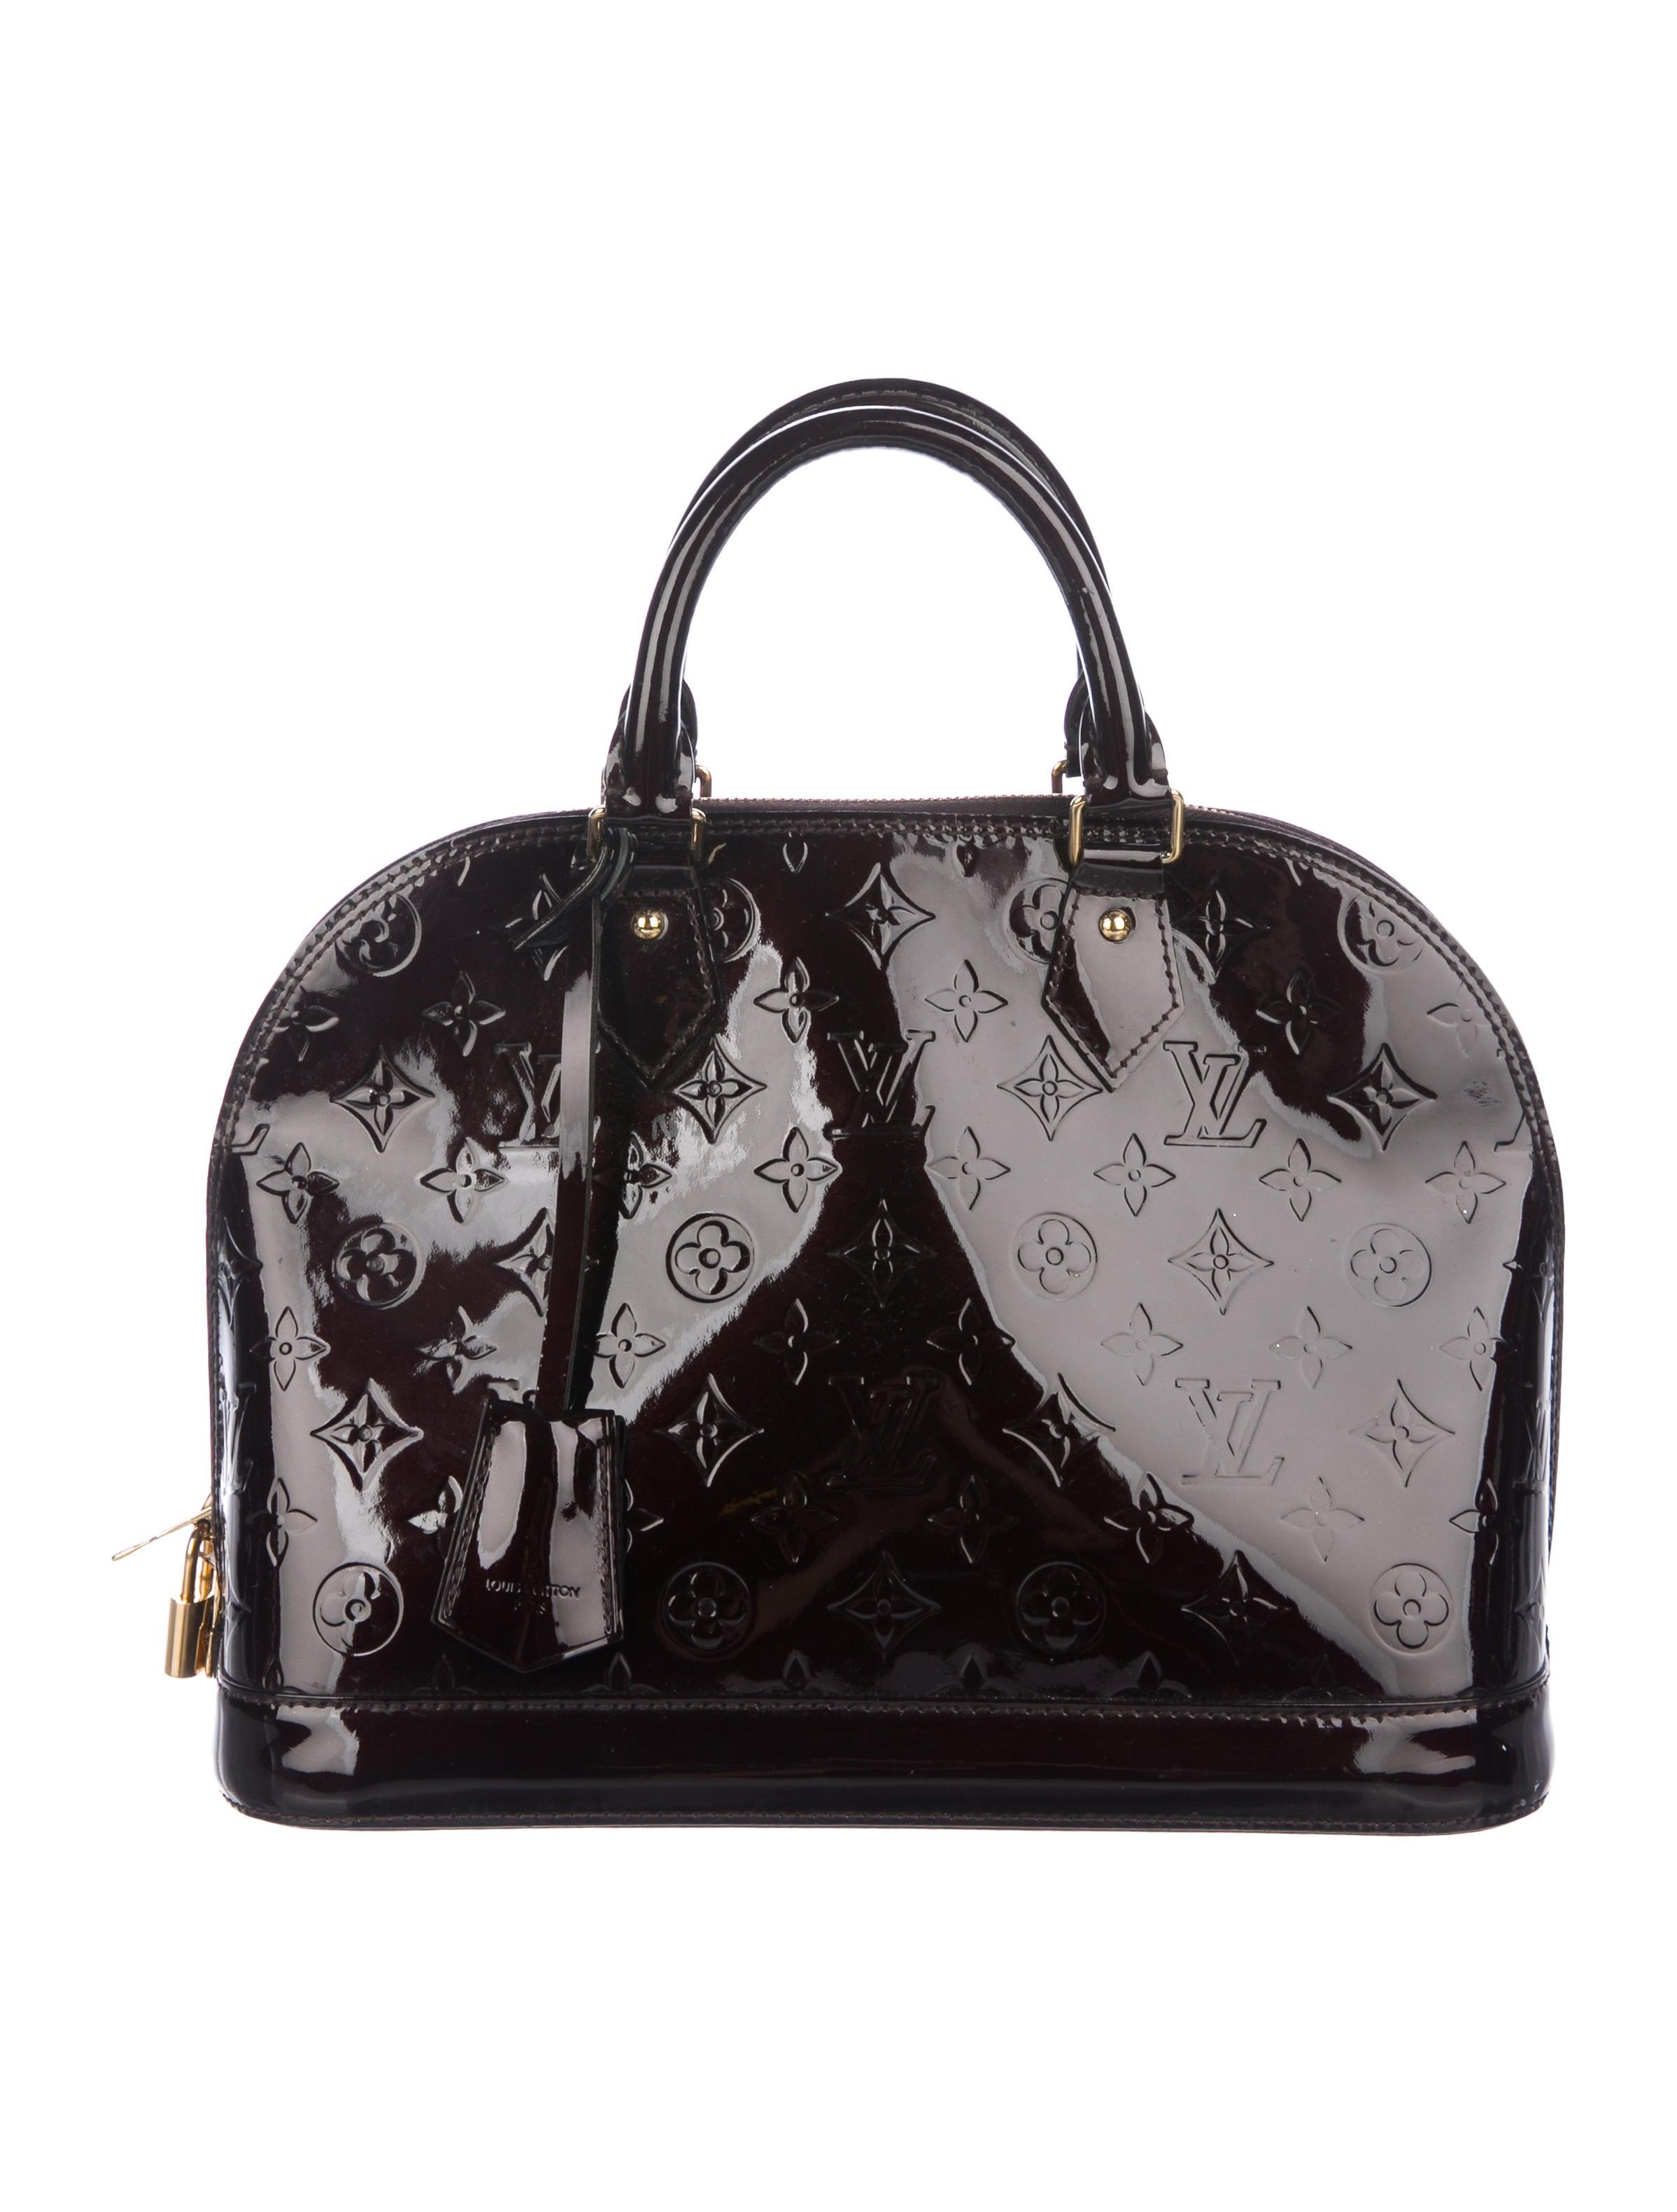 20d10d5579 Versace Embroidered Baroque Shoulder Bag - Handbags - VES39548 | The ...